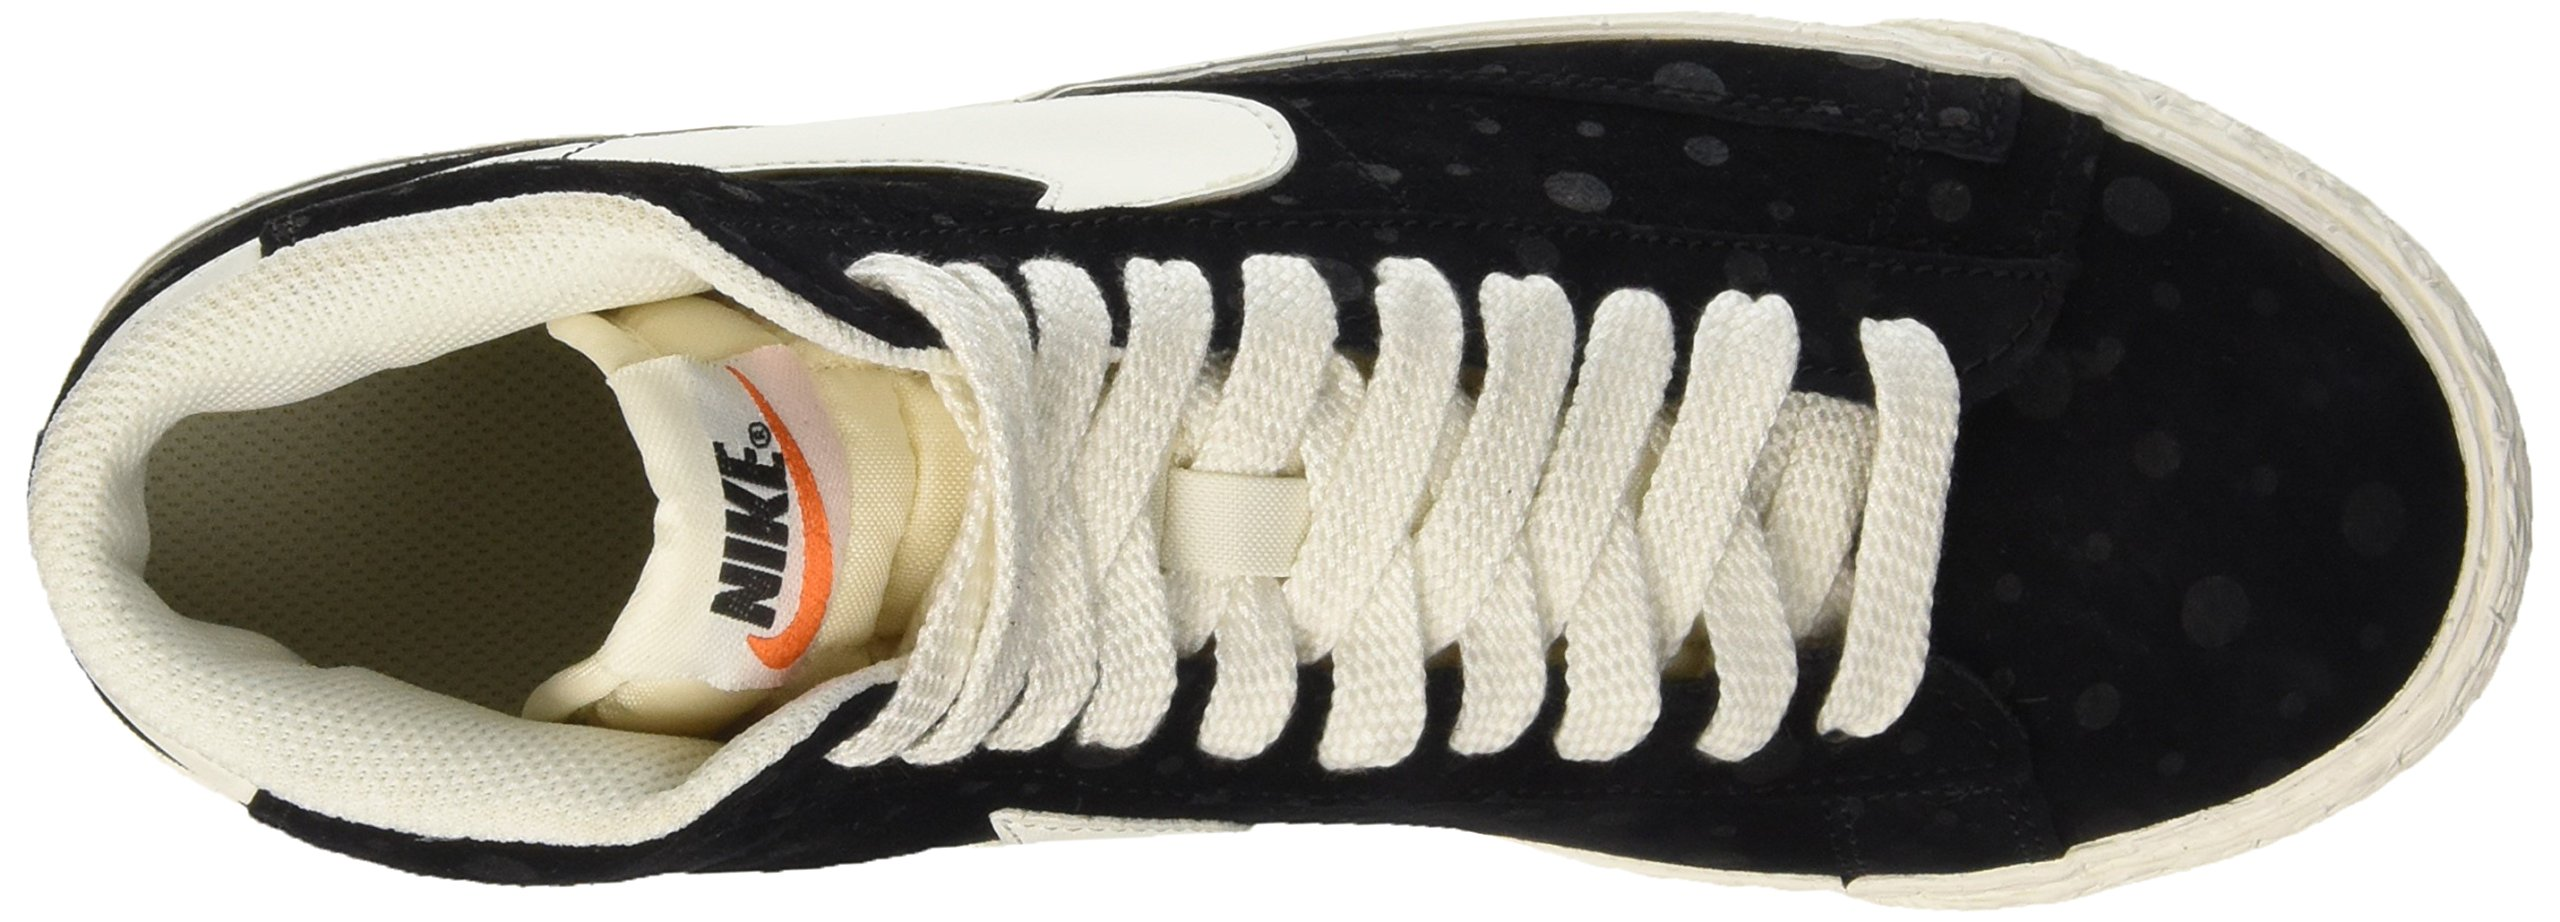 Nike Women's Blazer Mid Suede Vintage Black/White 518171-015 (SIZE: 8) by NIKE (Image #7)